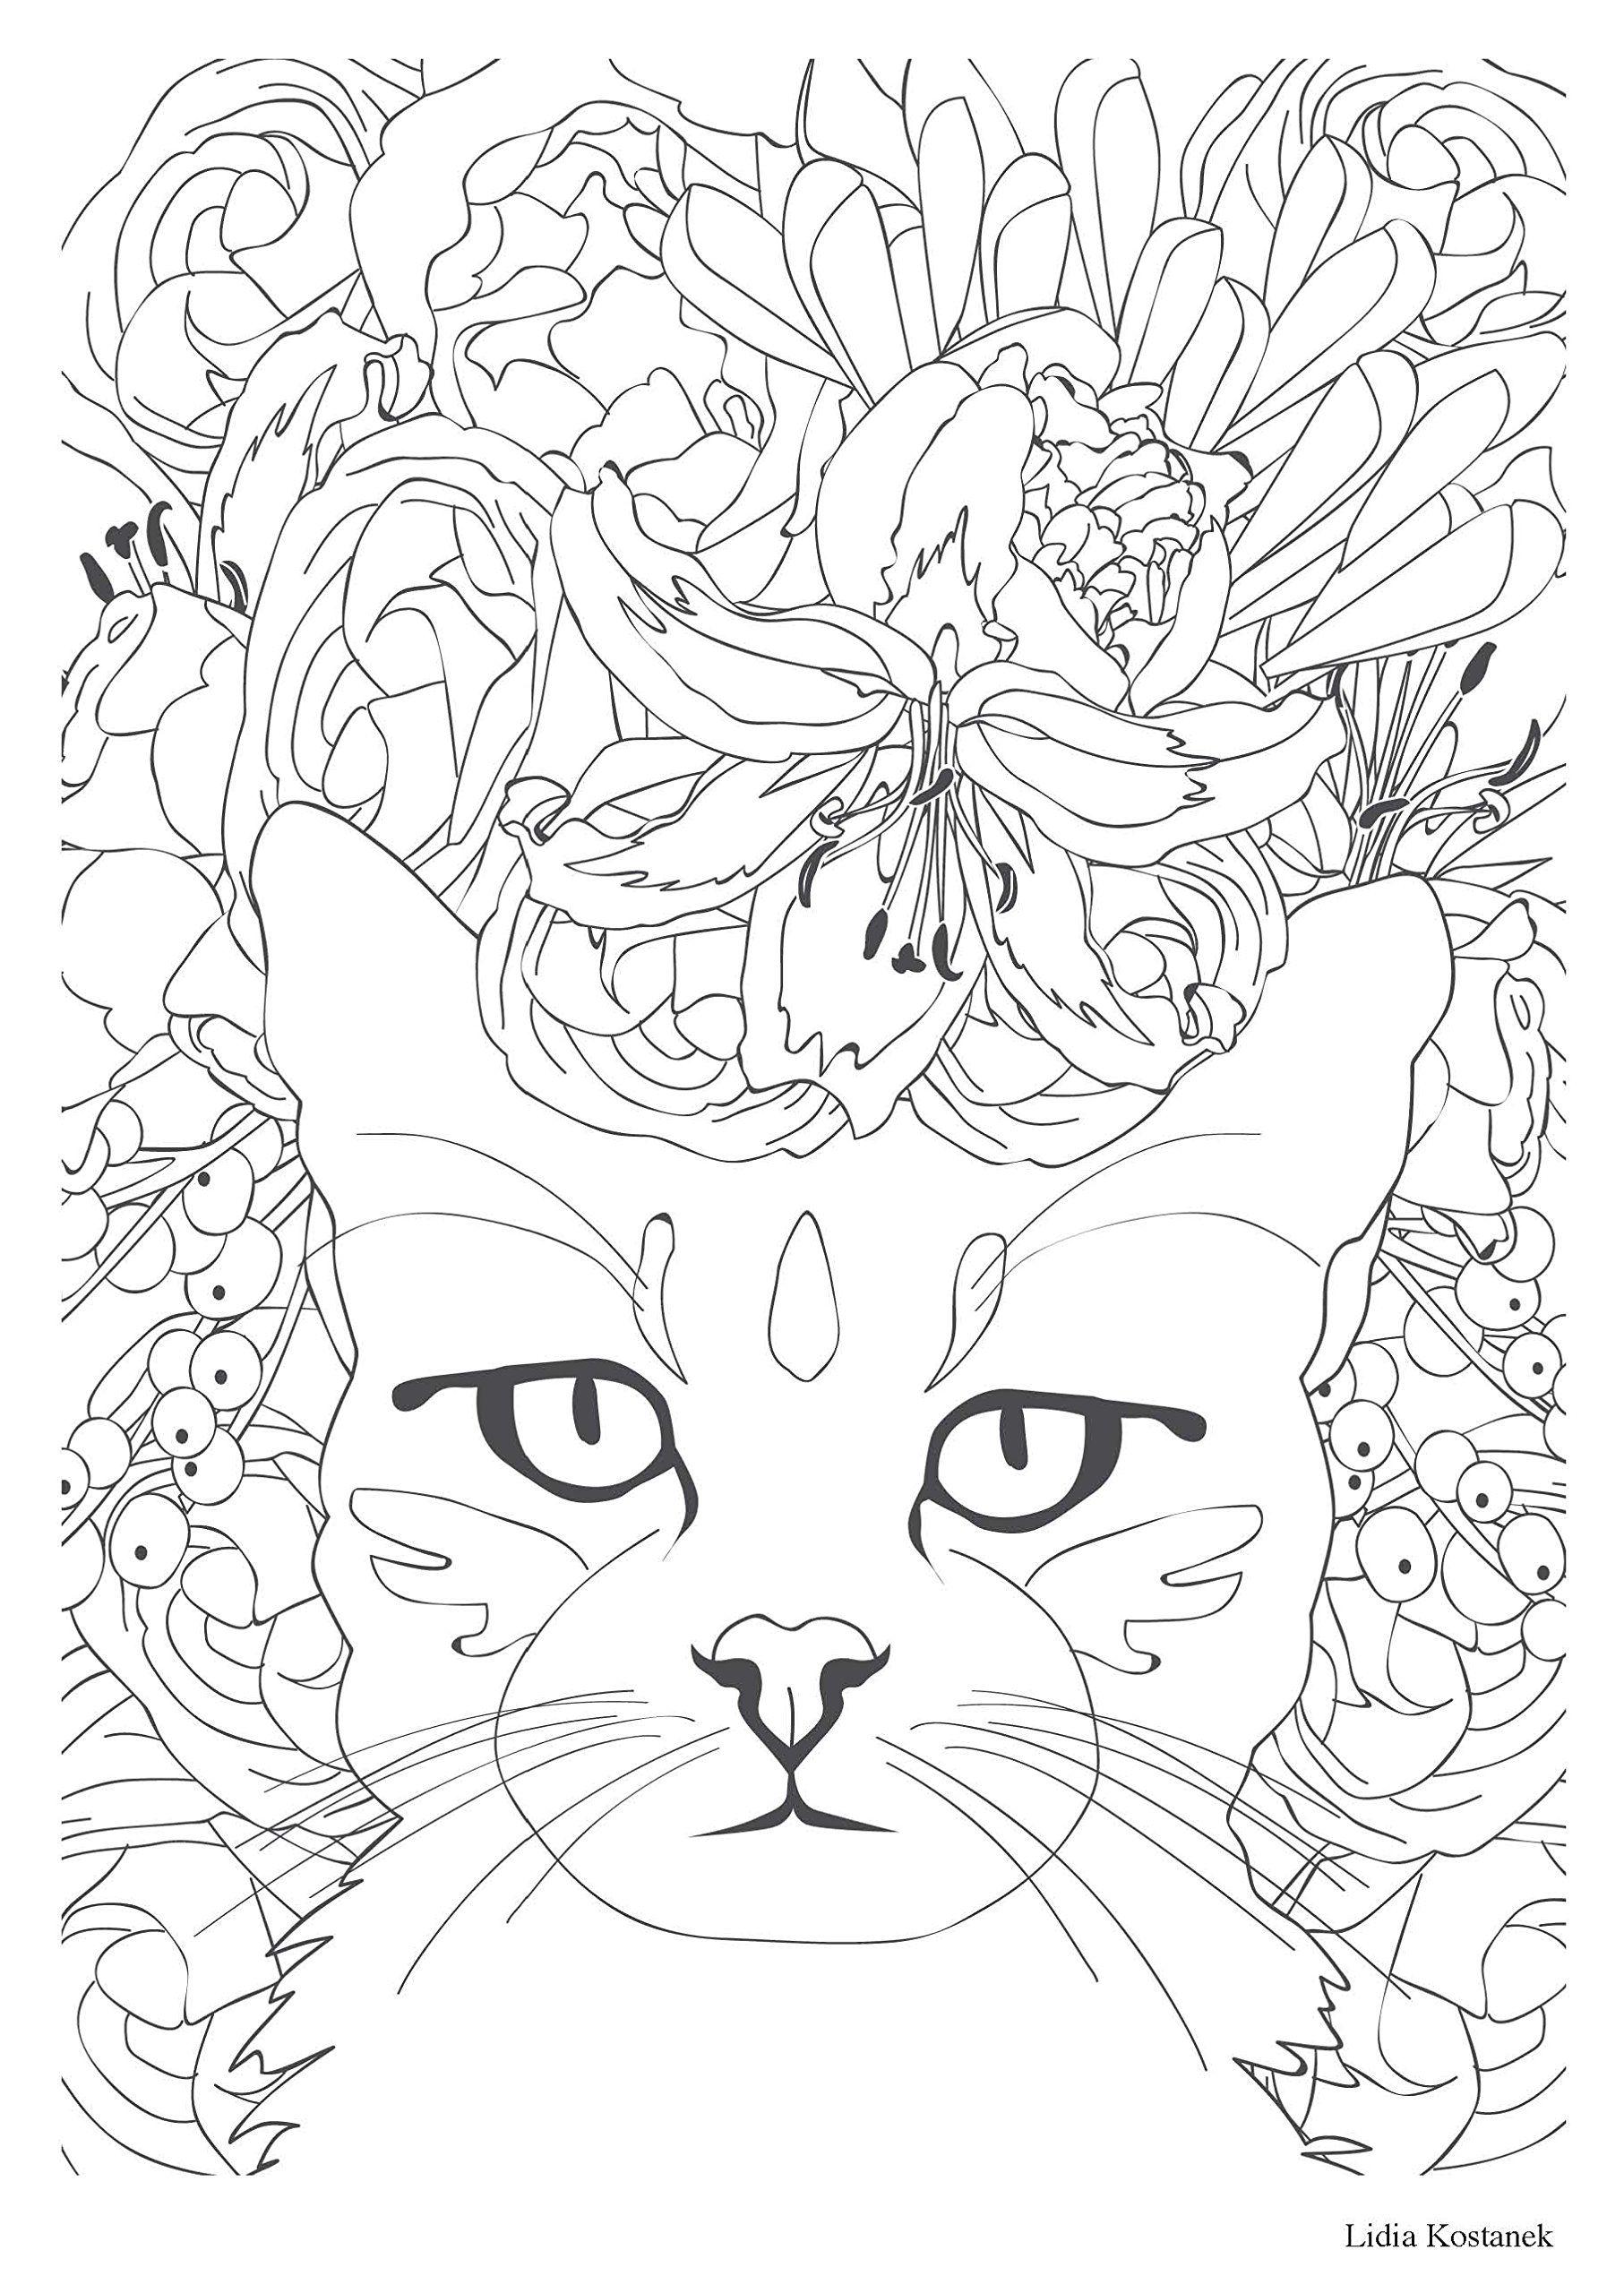 Gatos Desenhos Colorir Adultos With Images Cat Coloring Page